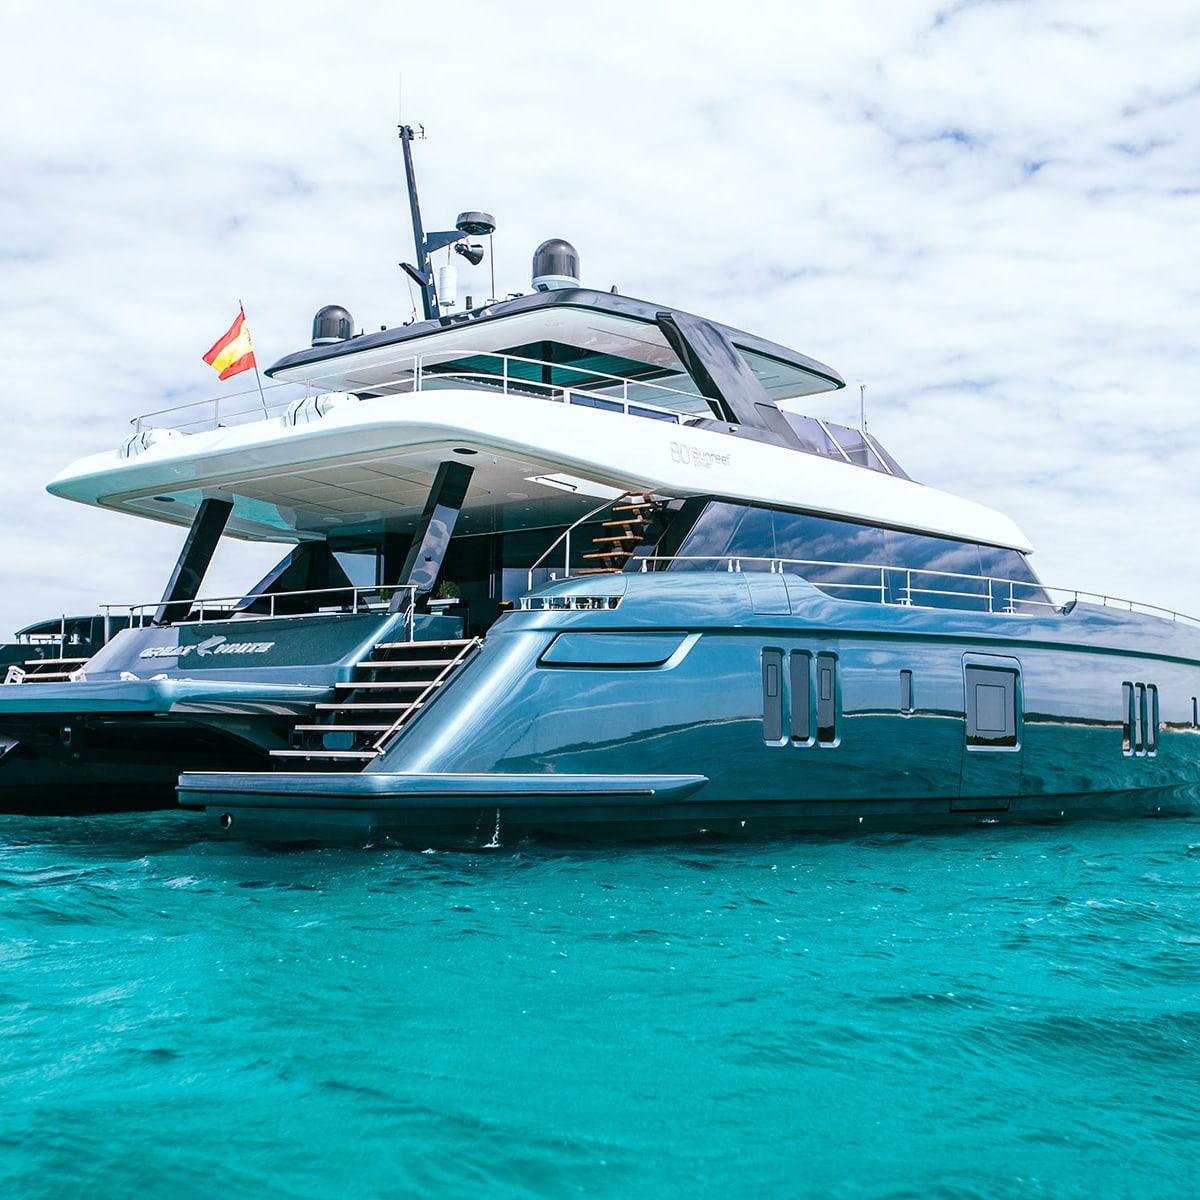 Tennis Superstar Rafael Nadal Is Loving His New 80 Foot Sunreef Power Boat Yachts International